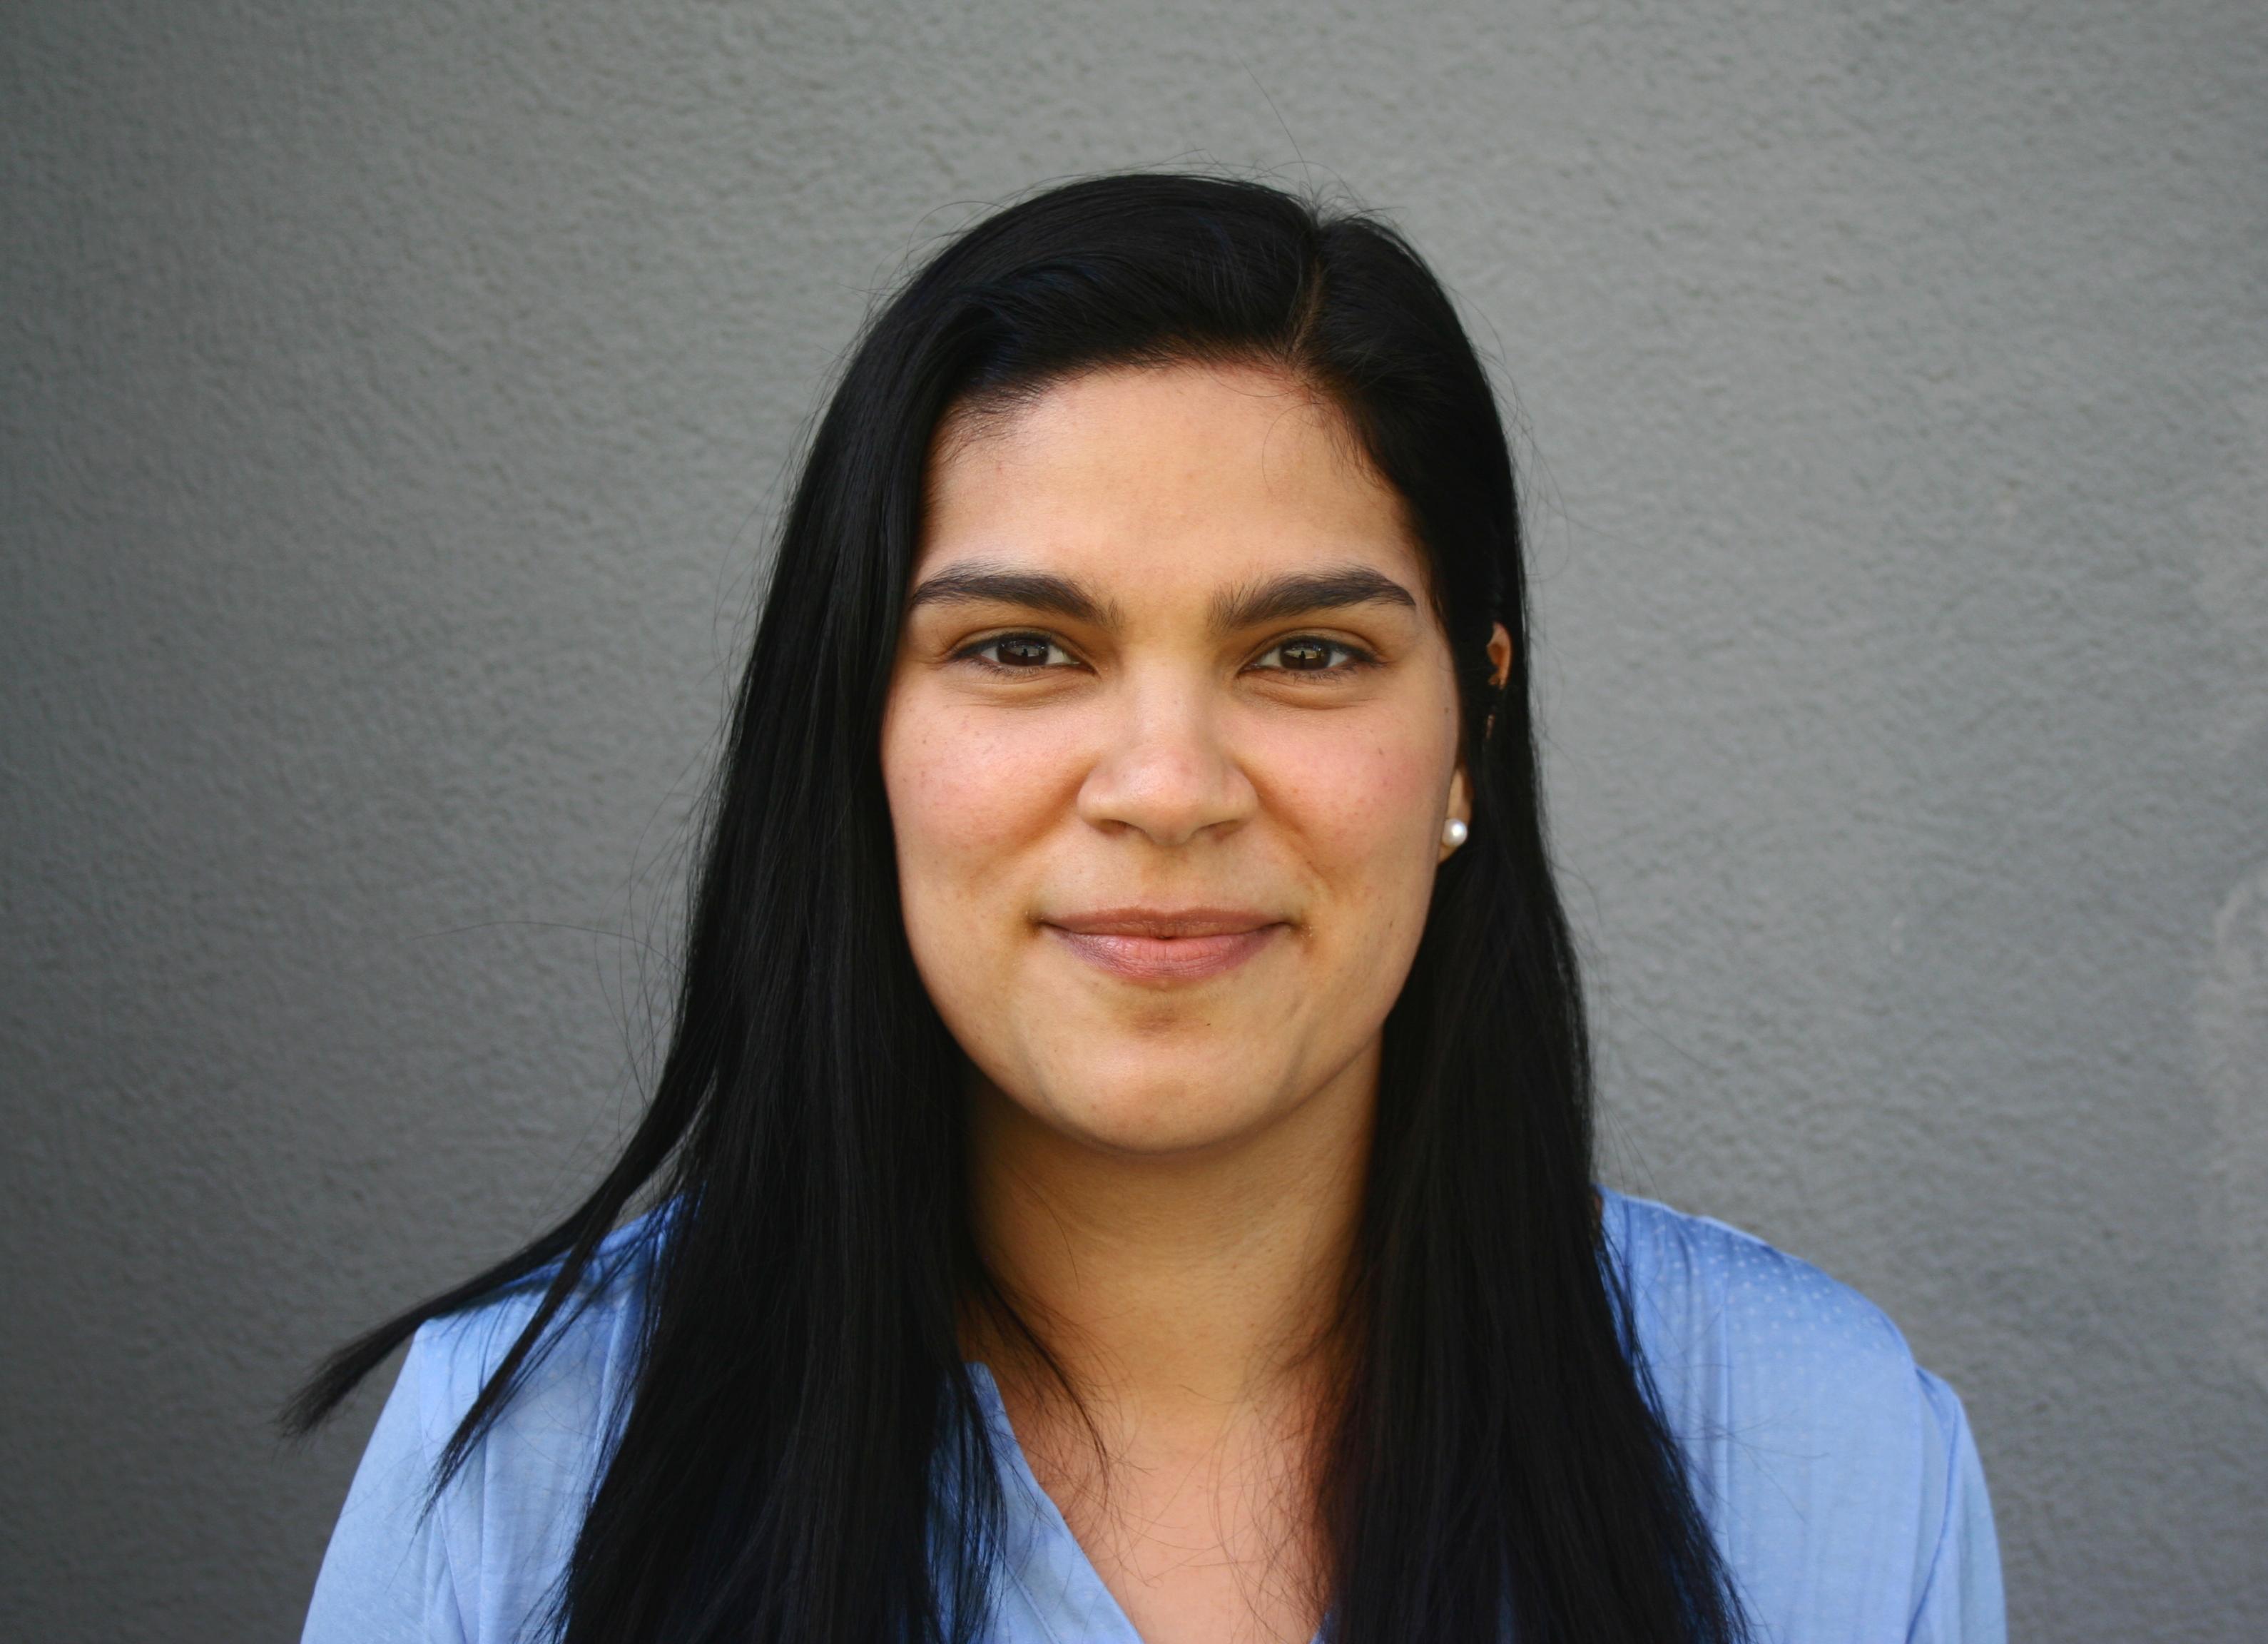 Lina E. Cuevas Ramírez